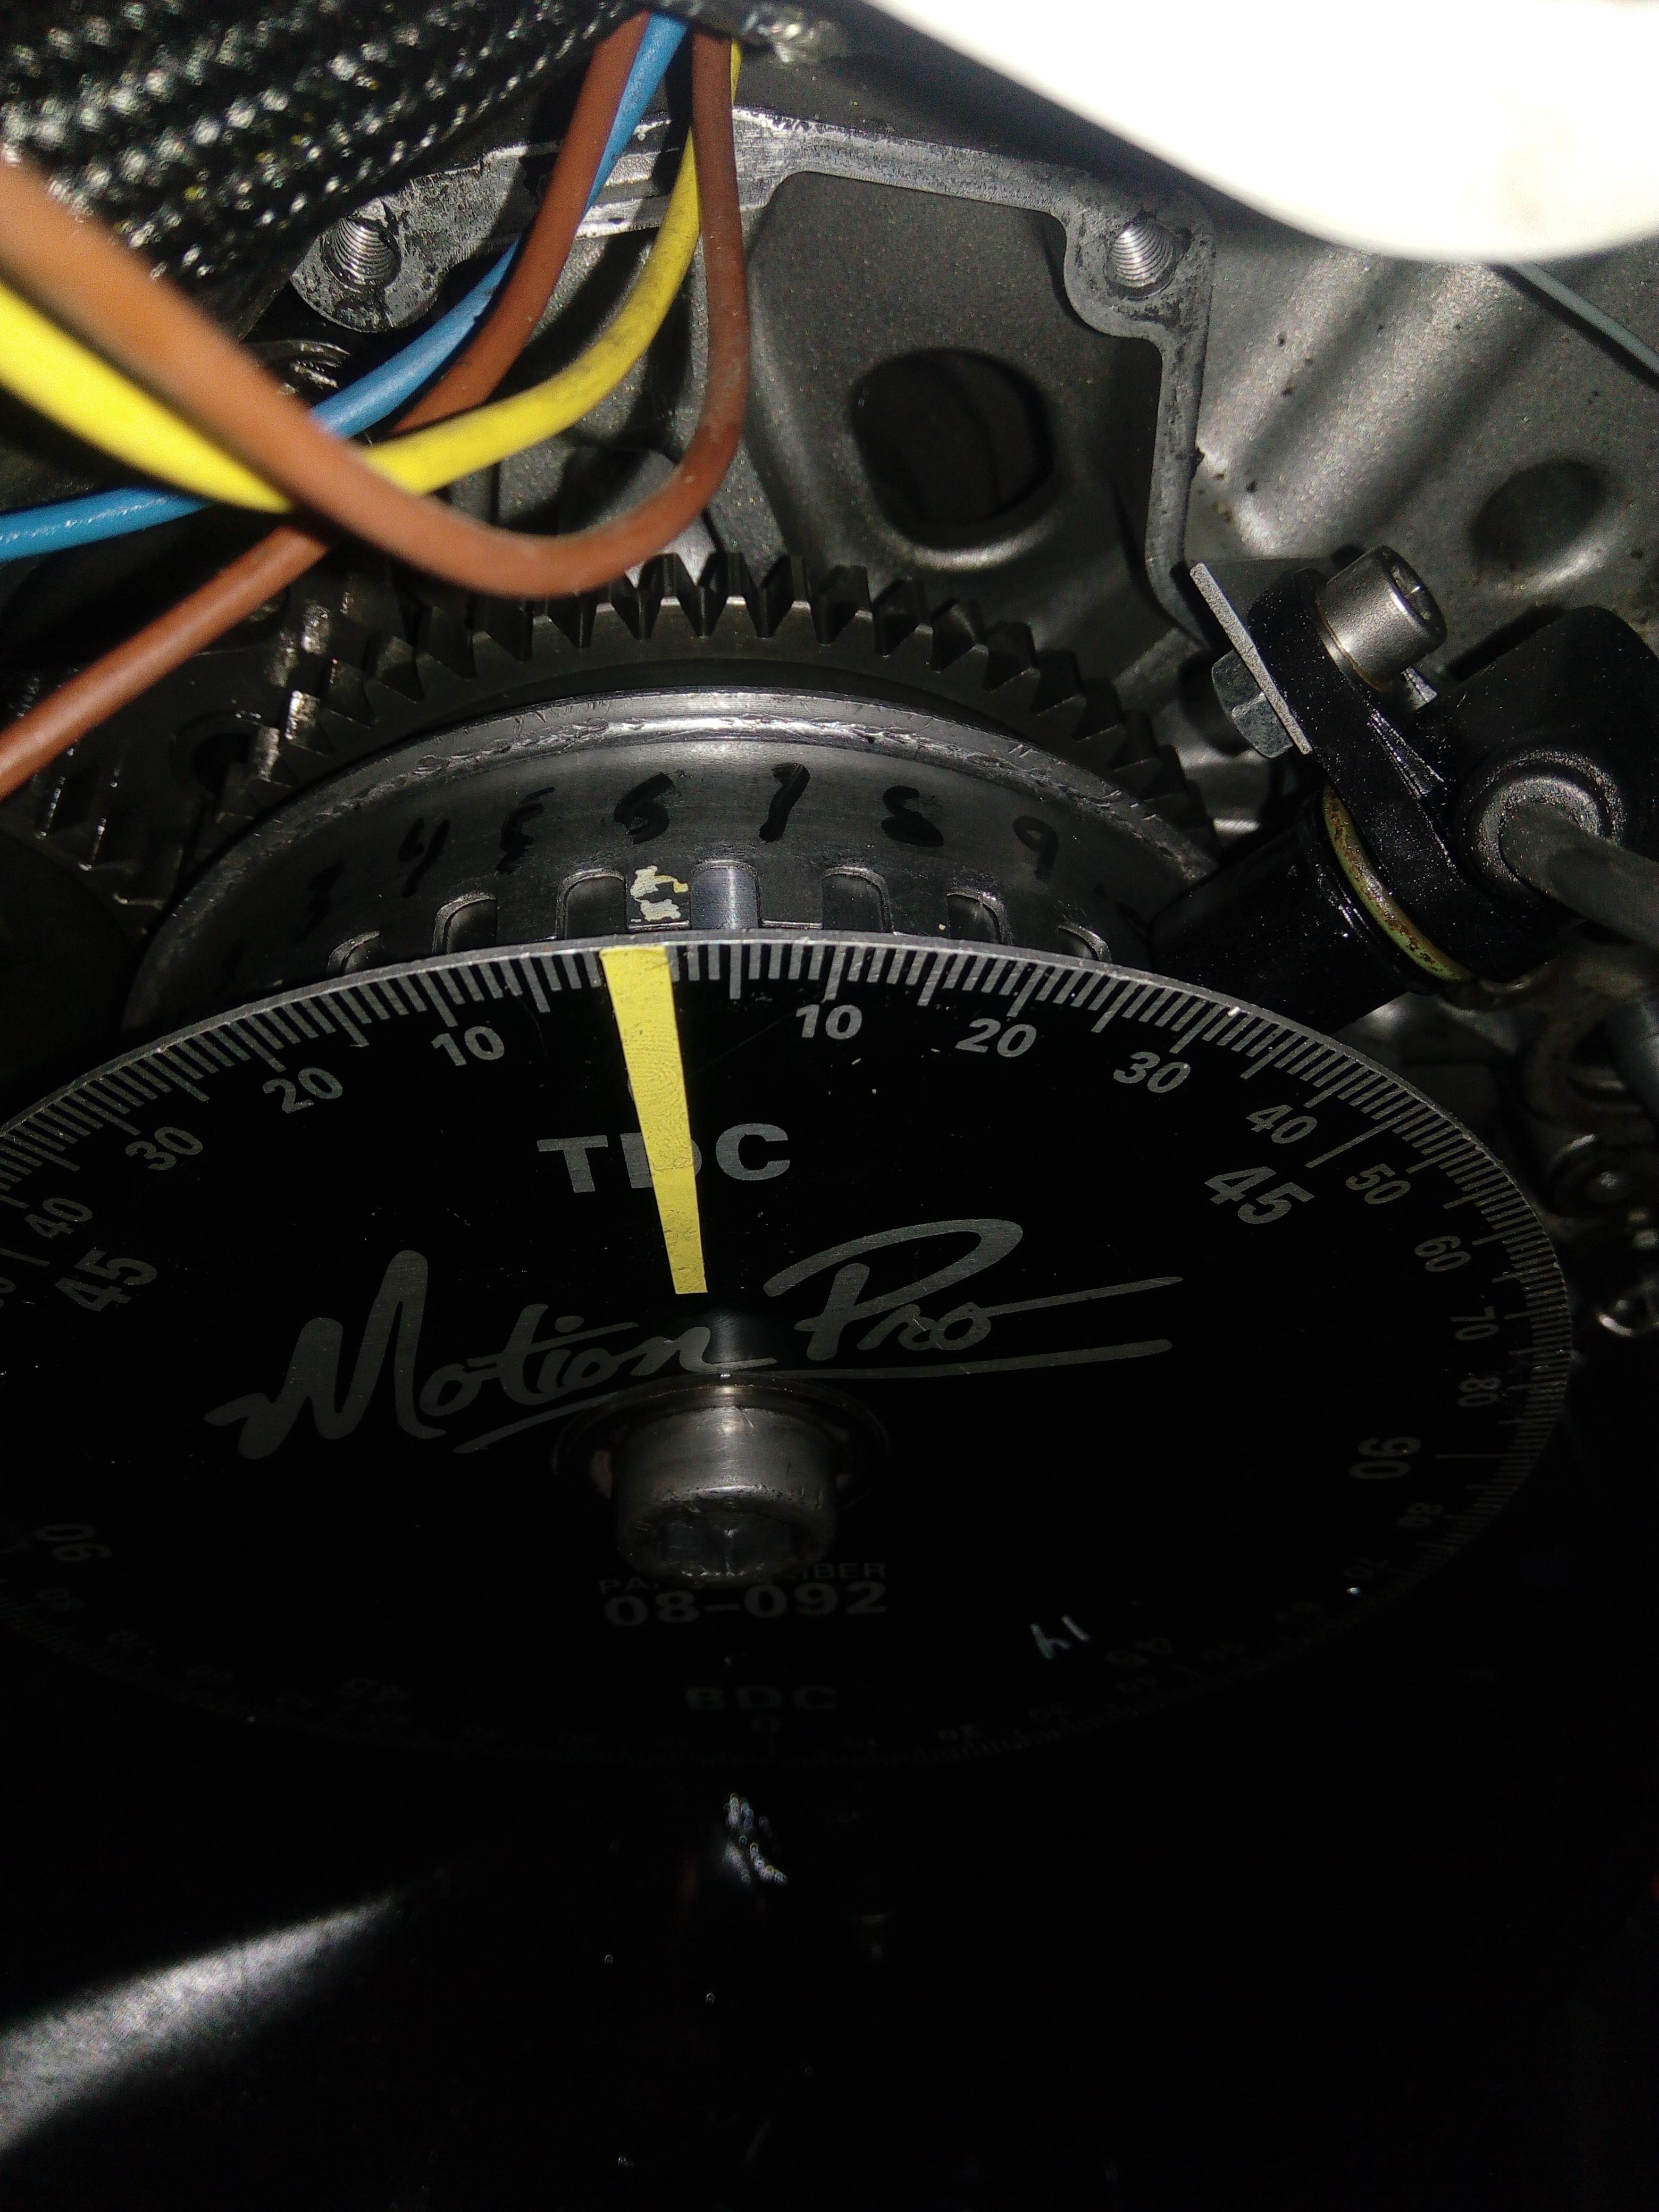 Cylinder%201%20in%20TDC.jpg